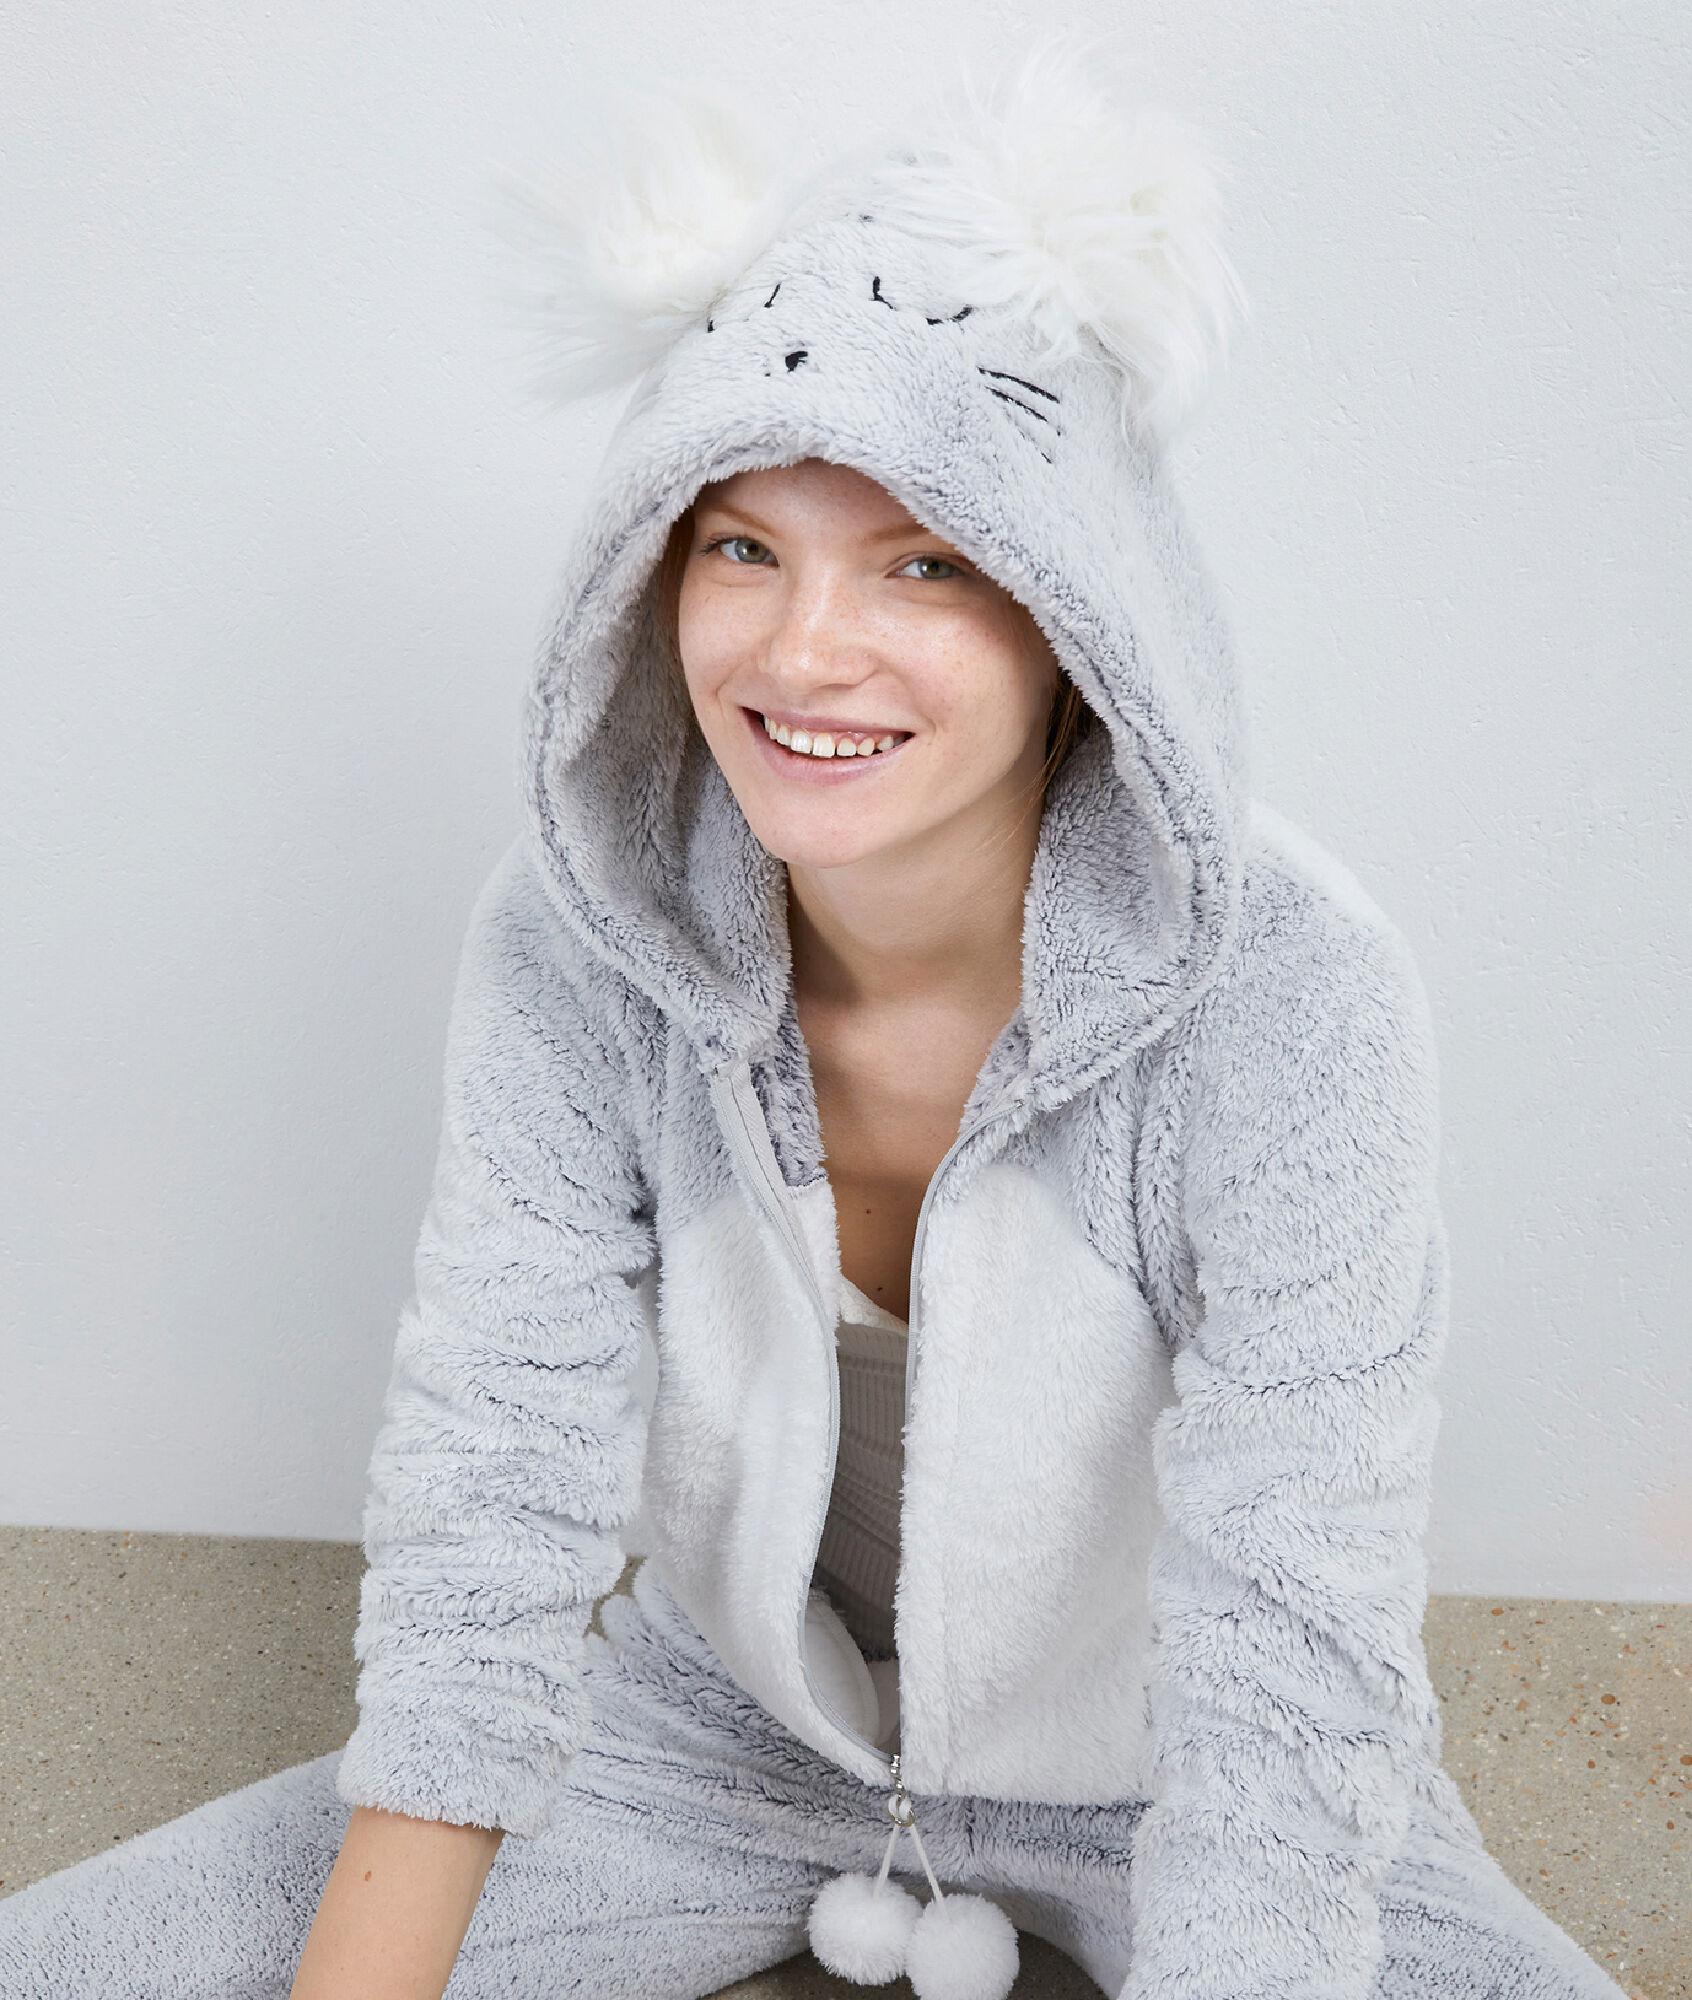 Pyjama Pyjama Combinaison Gris Etam Gris Souris Combinaison IH2WYED9